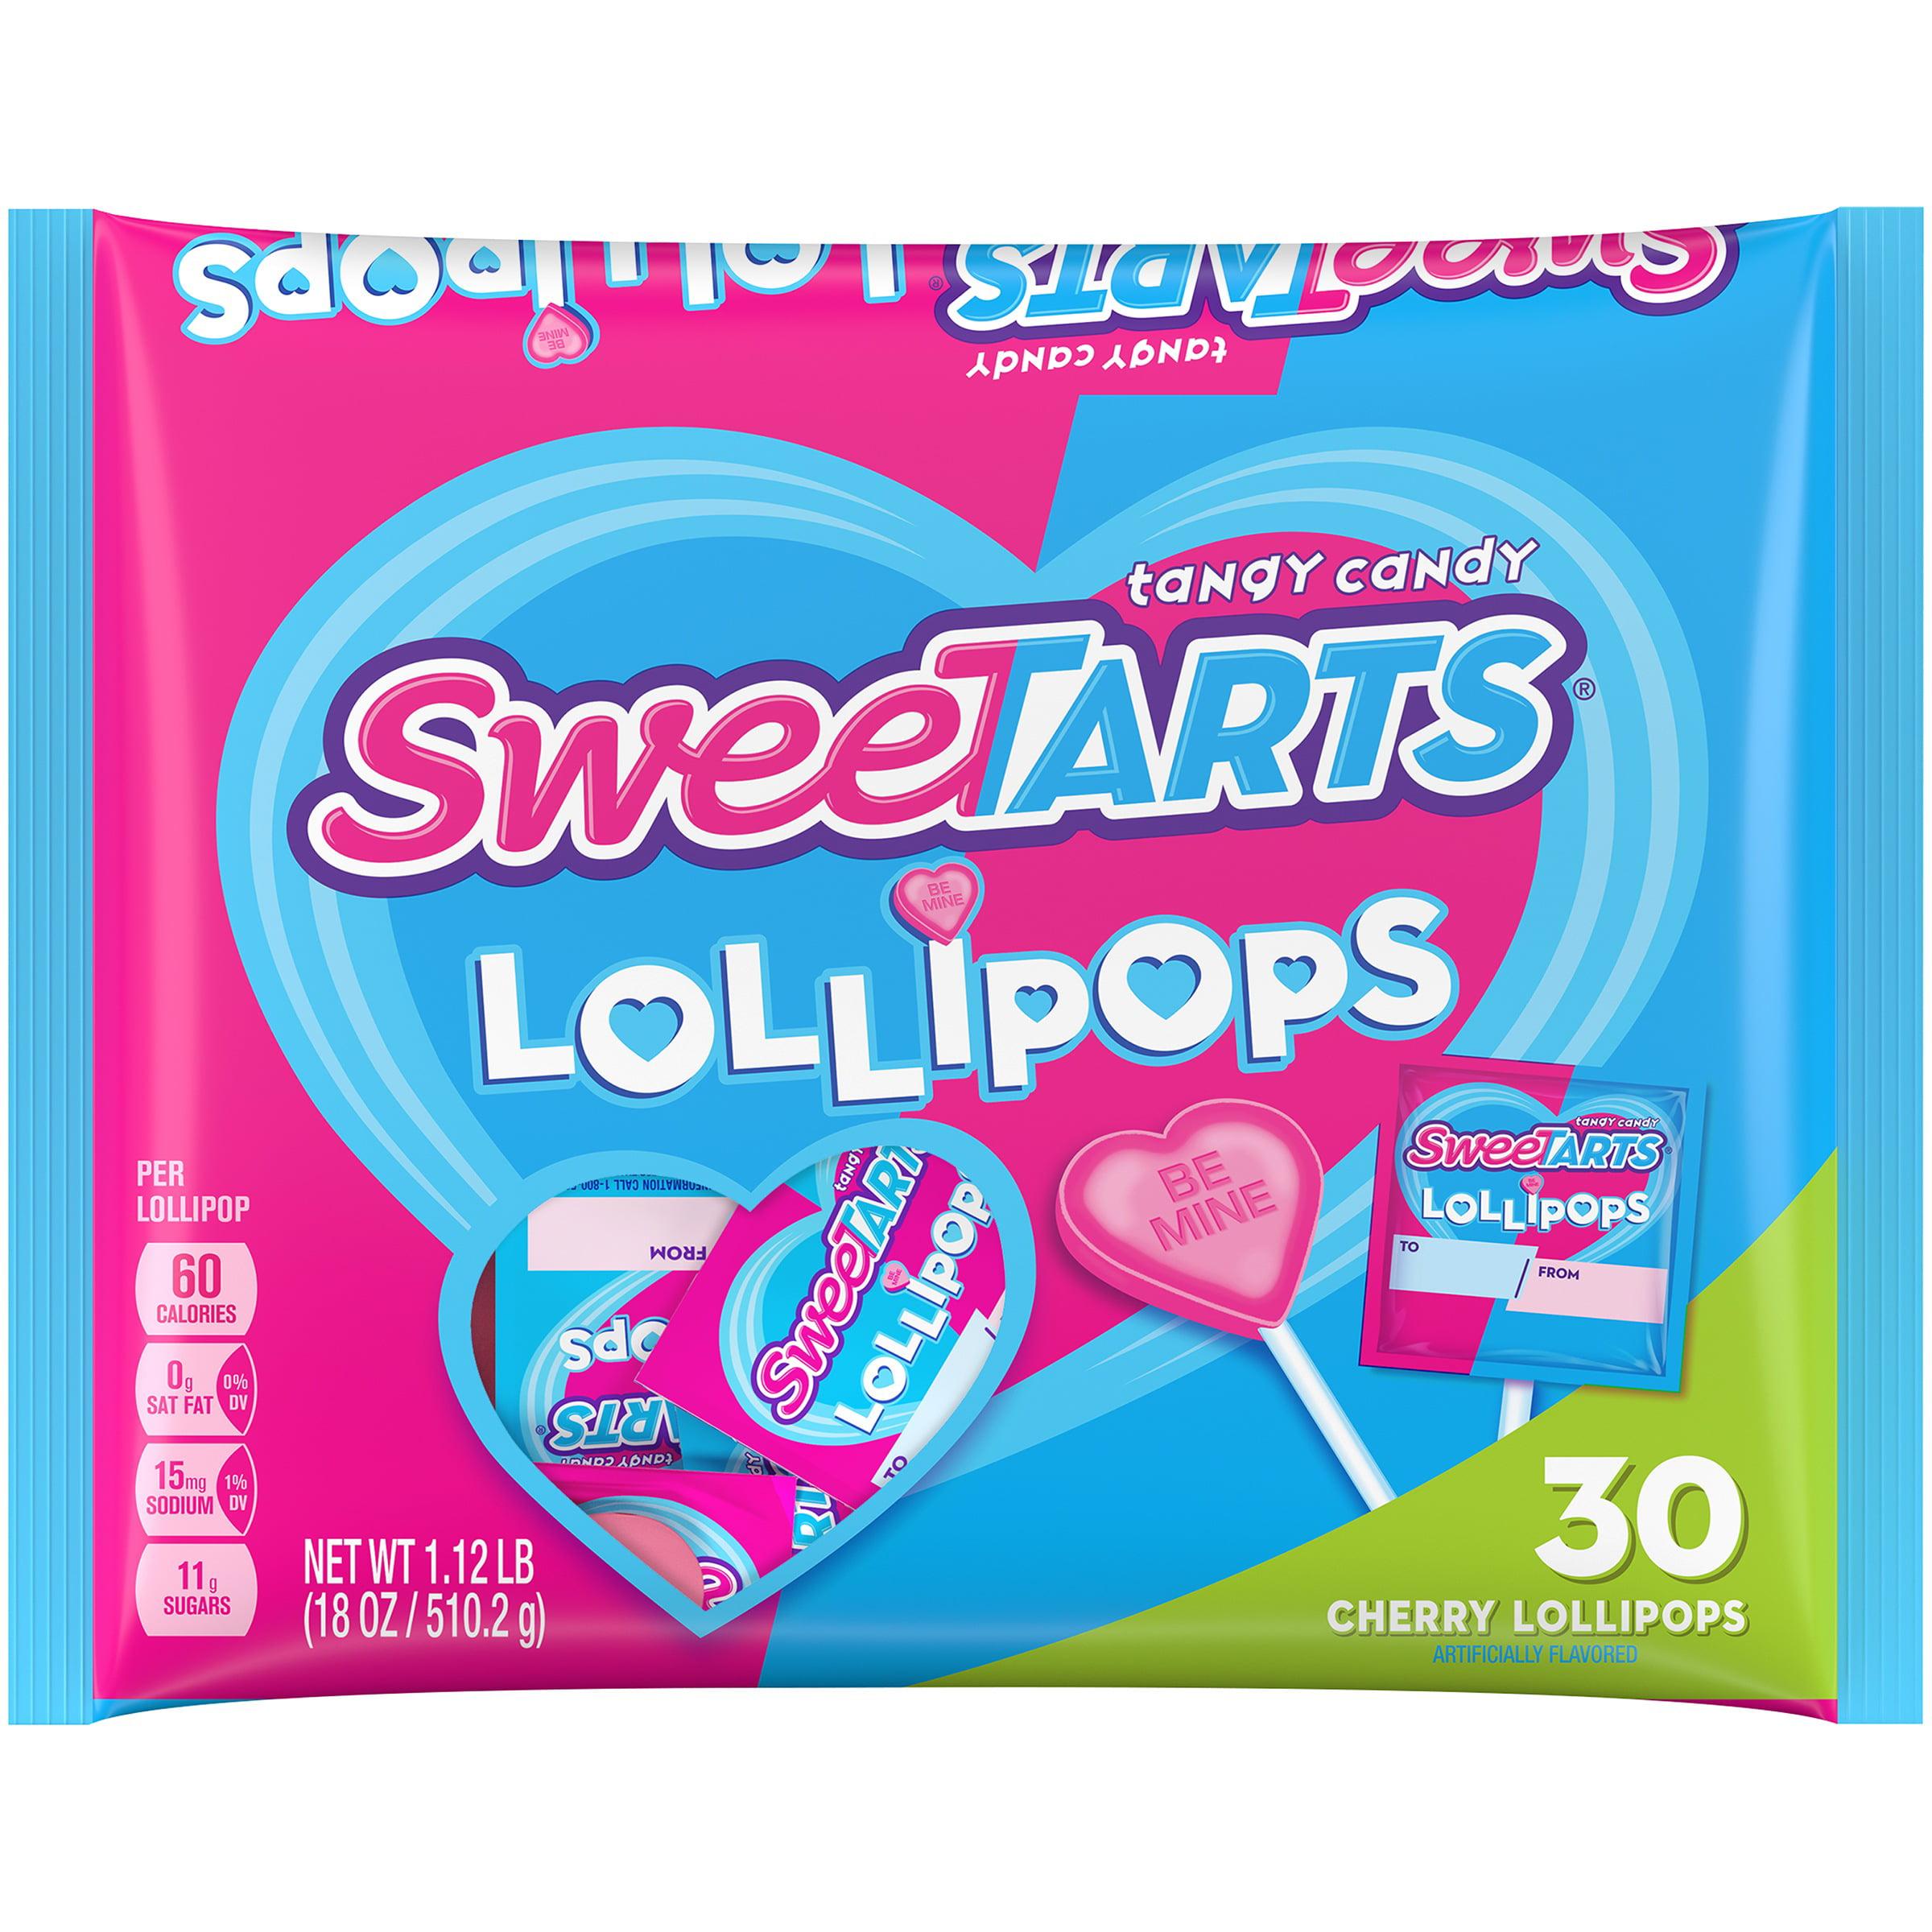 SWEETARTS Lollipops, 18 oz bag, 30 count - Walmart.com